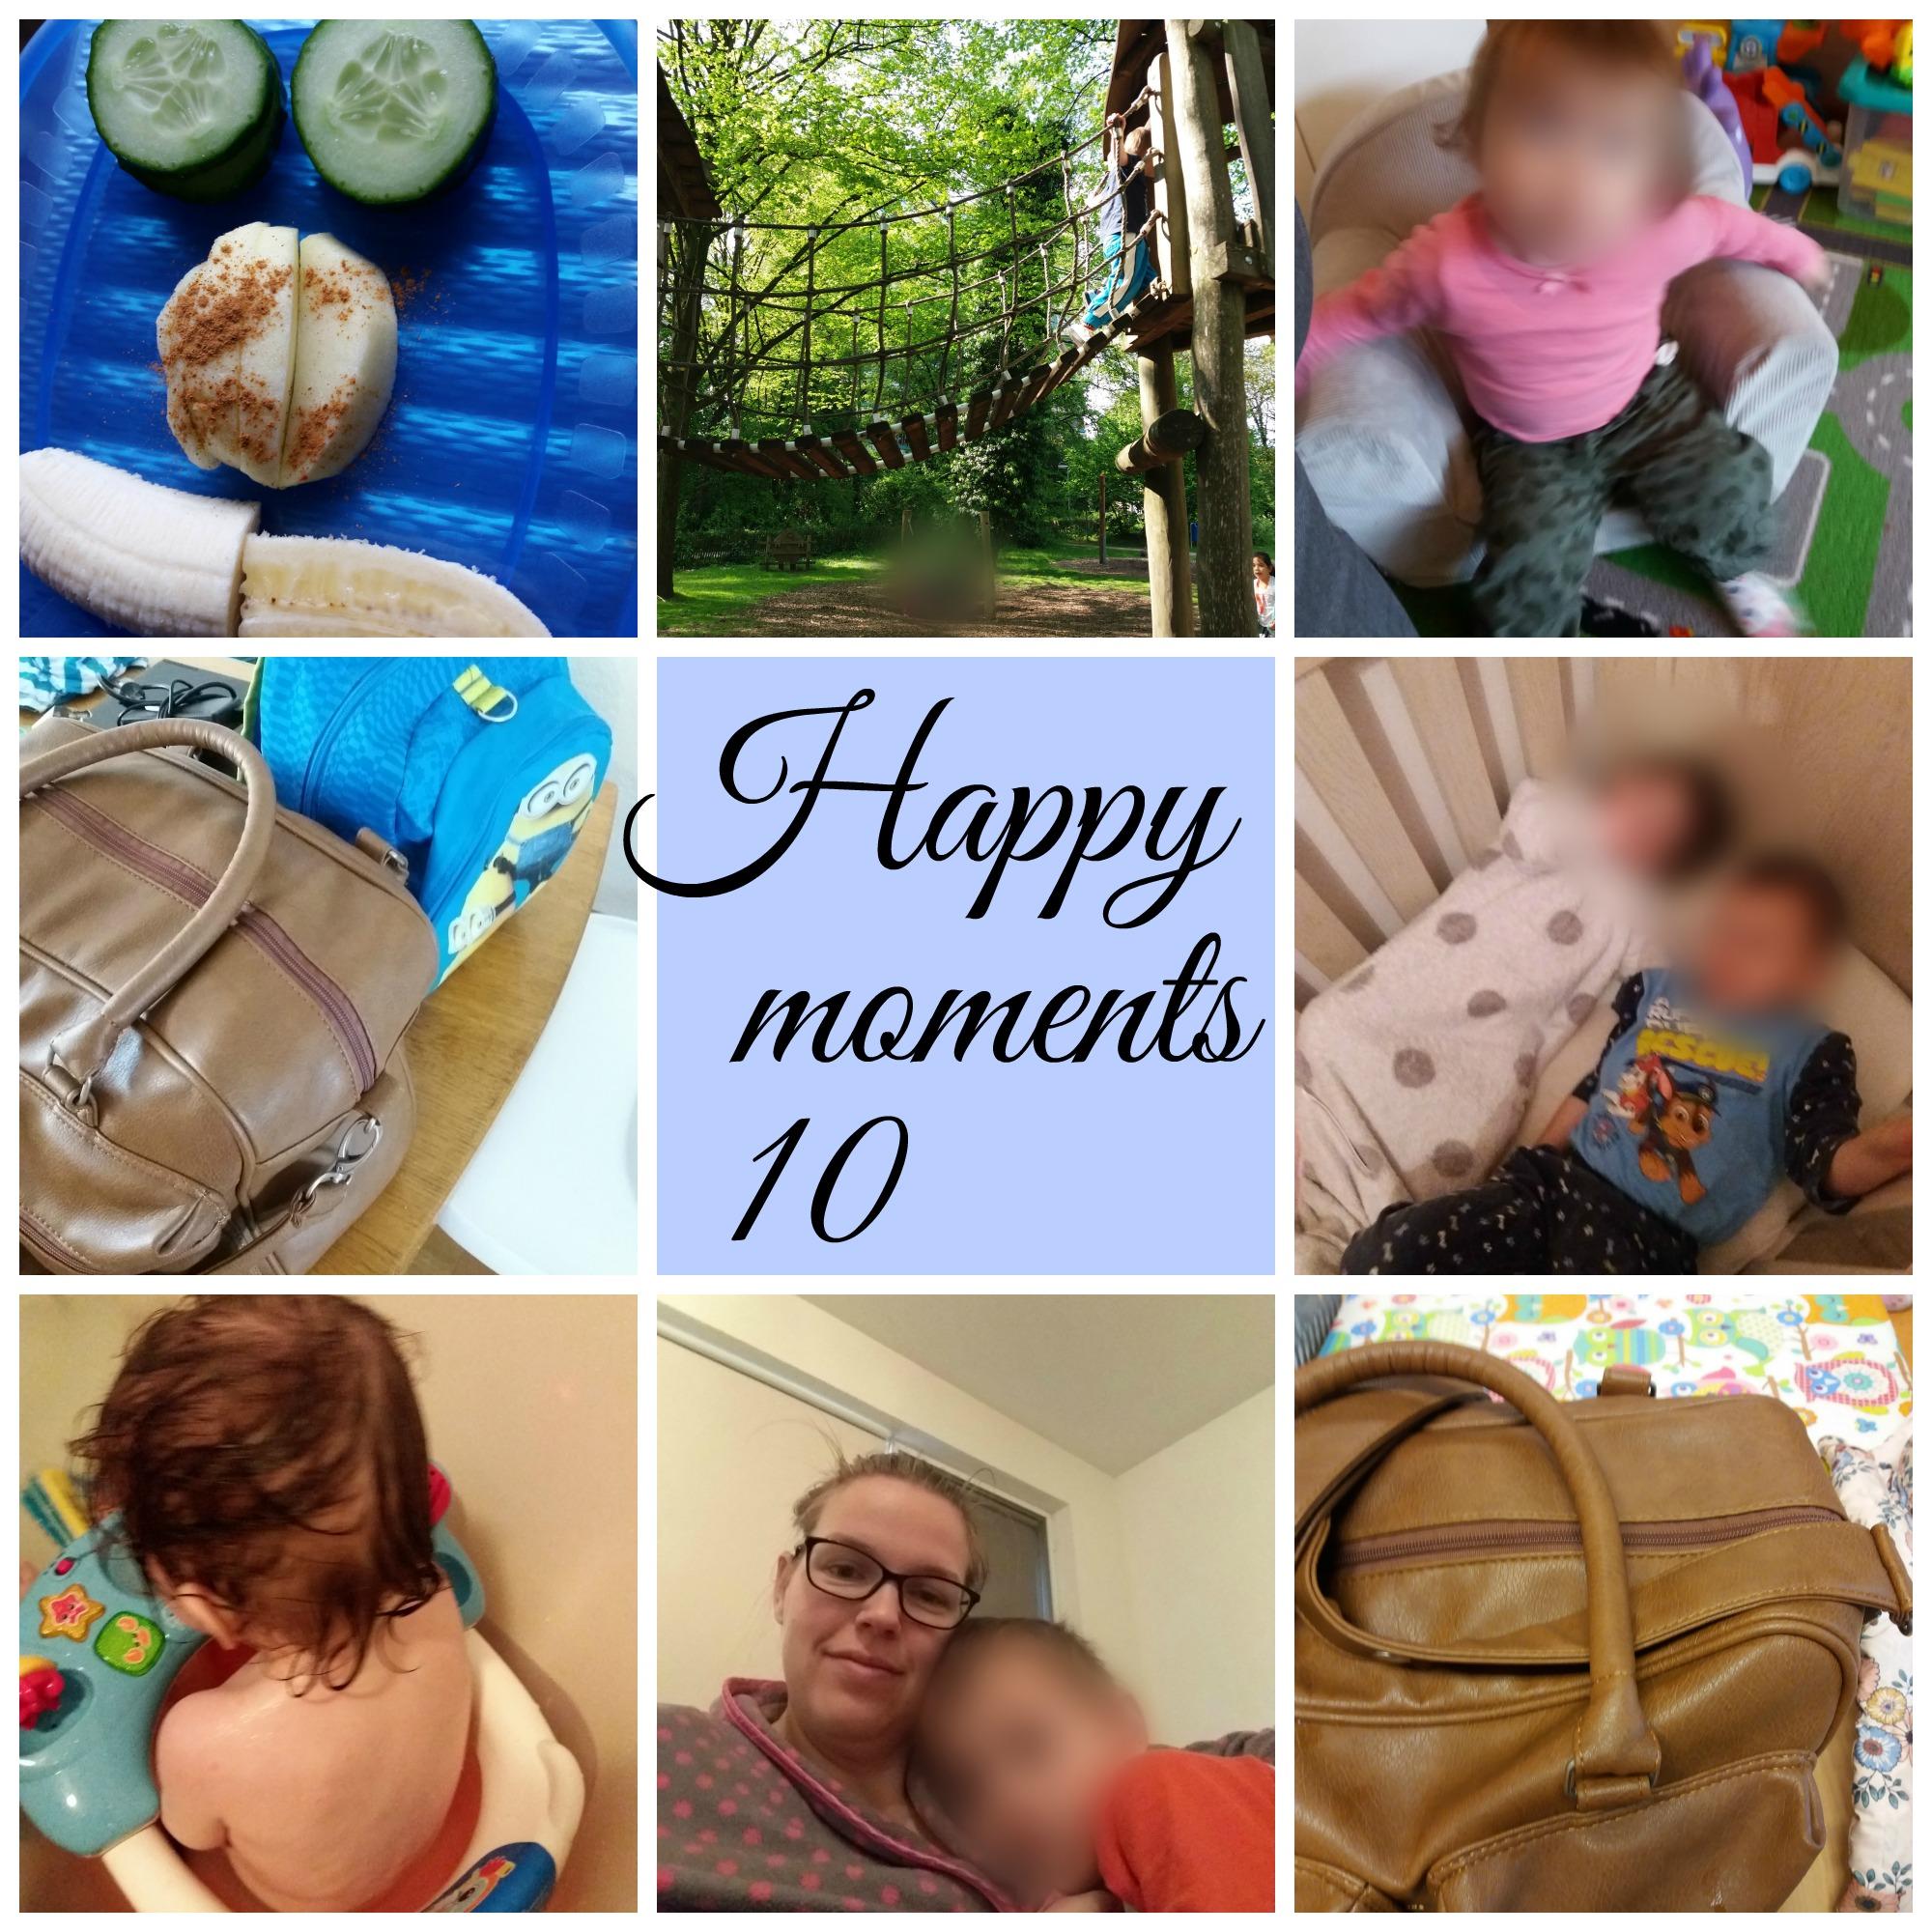 Happy moments #10